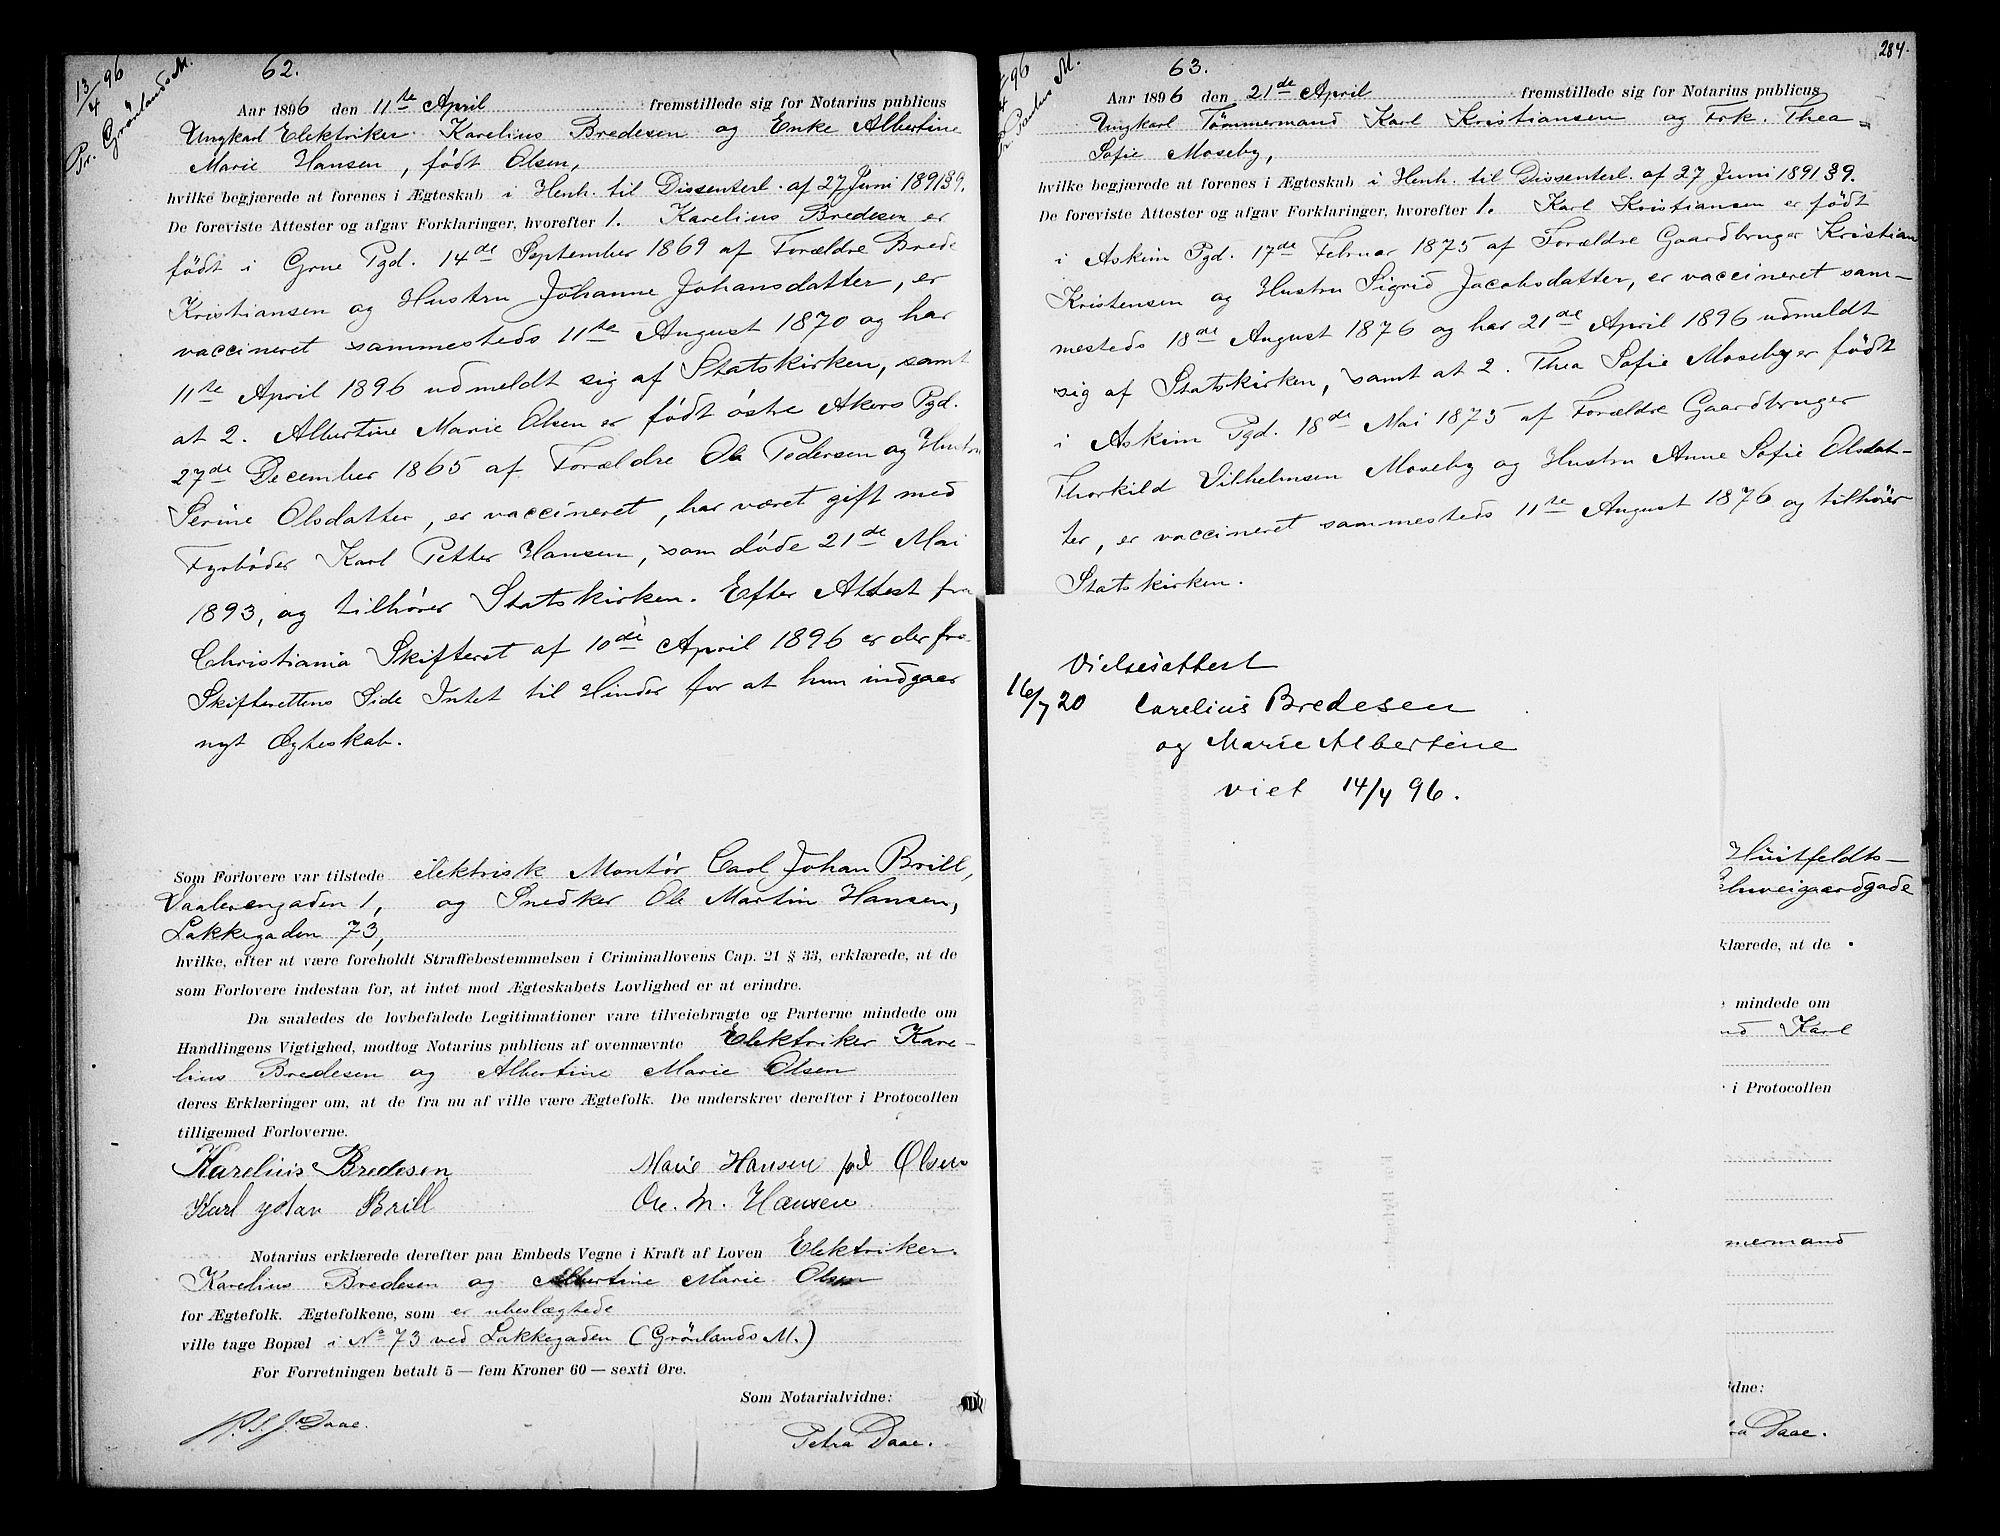 SAO, Oslo byfogd avd. I, L/Lb/Lbb/L0002: Notarialprotokoll, rekke II: Vigsler, 1893-1897, s. 283b-284a